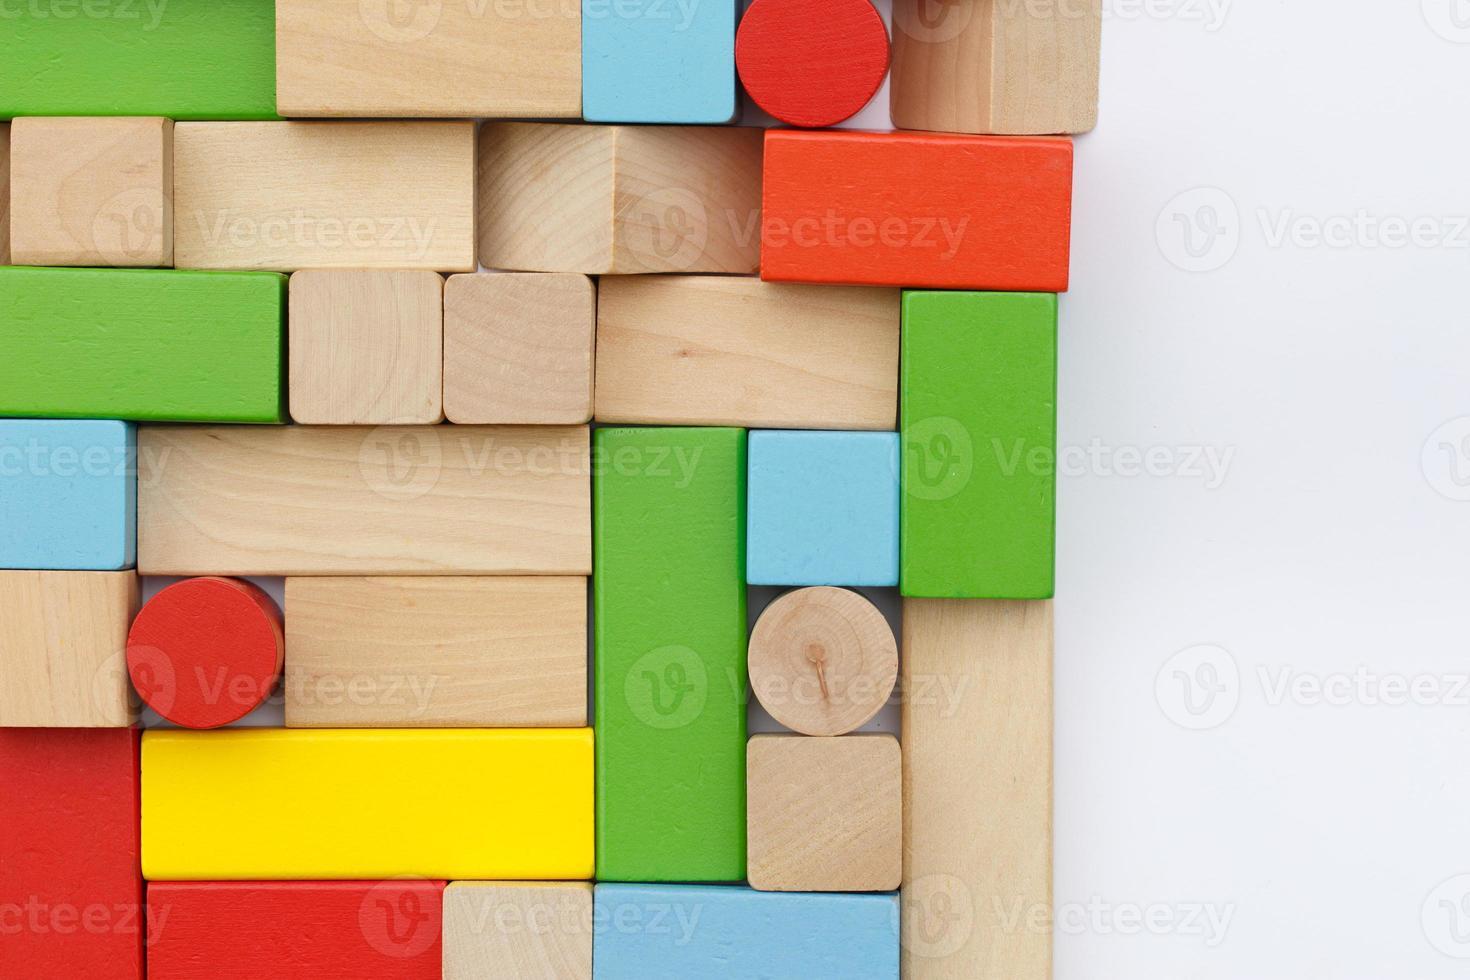 blocos de madeira isolados no fundo branco foto